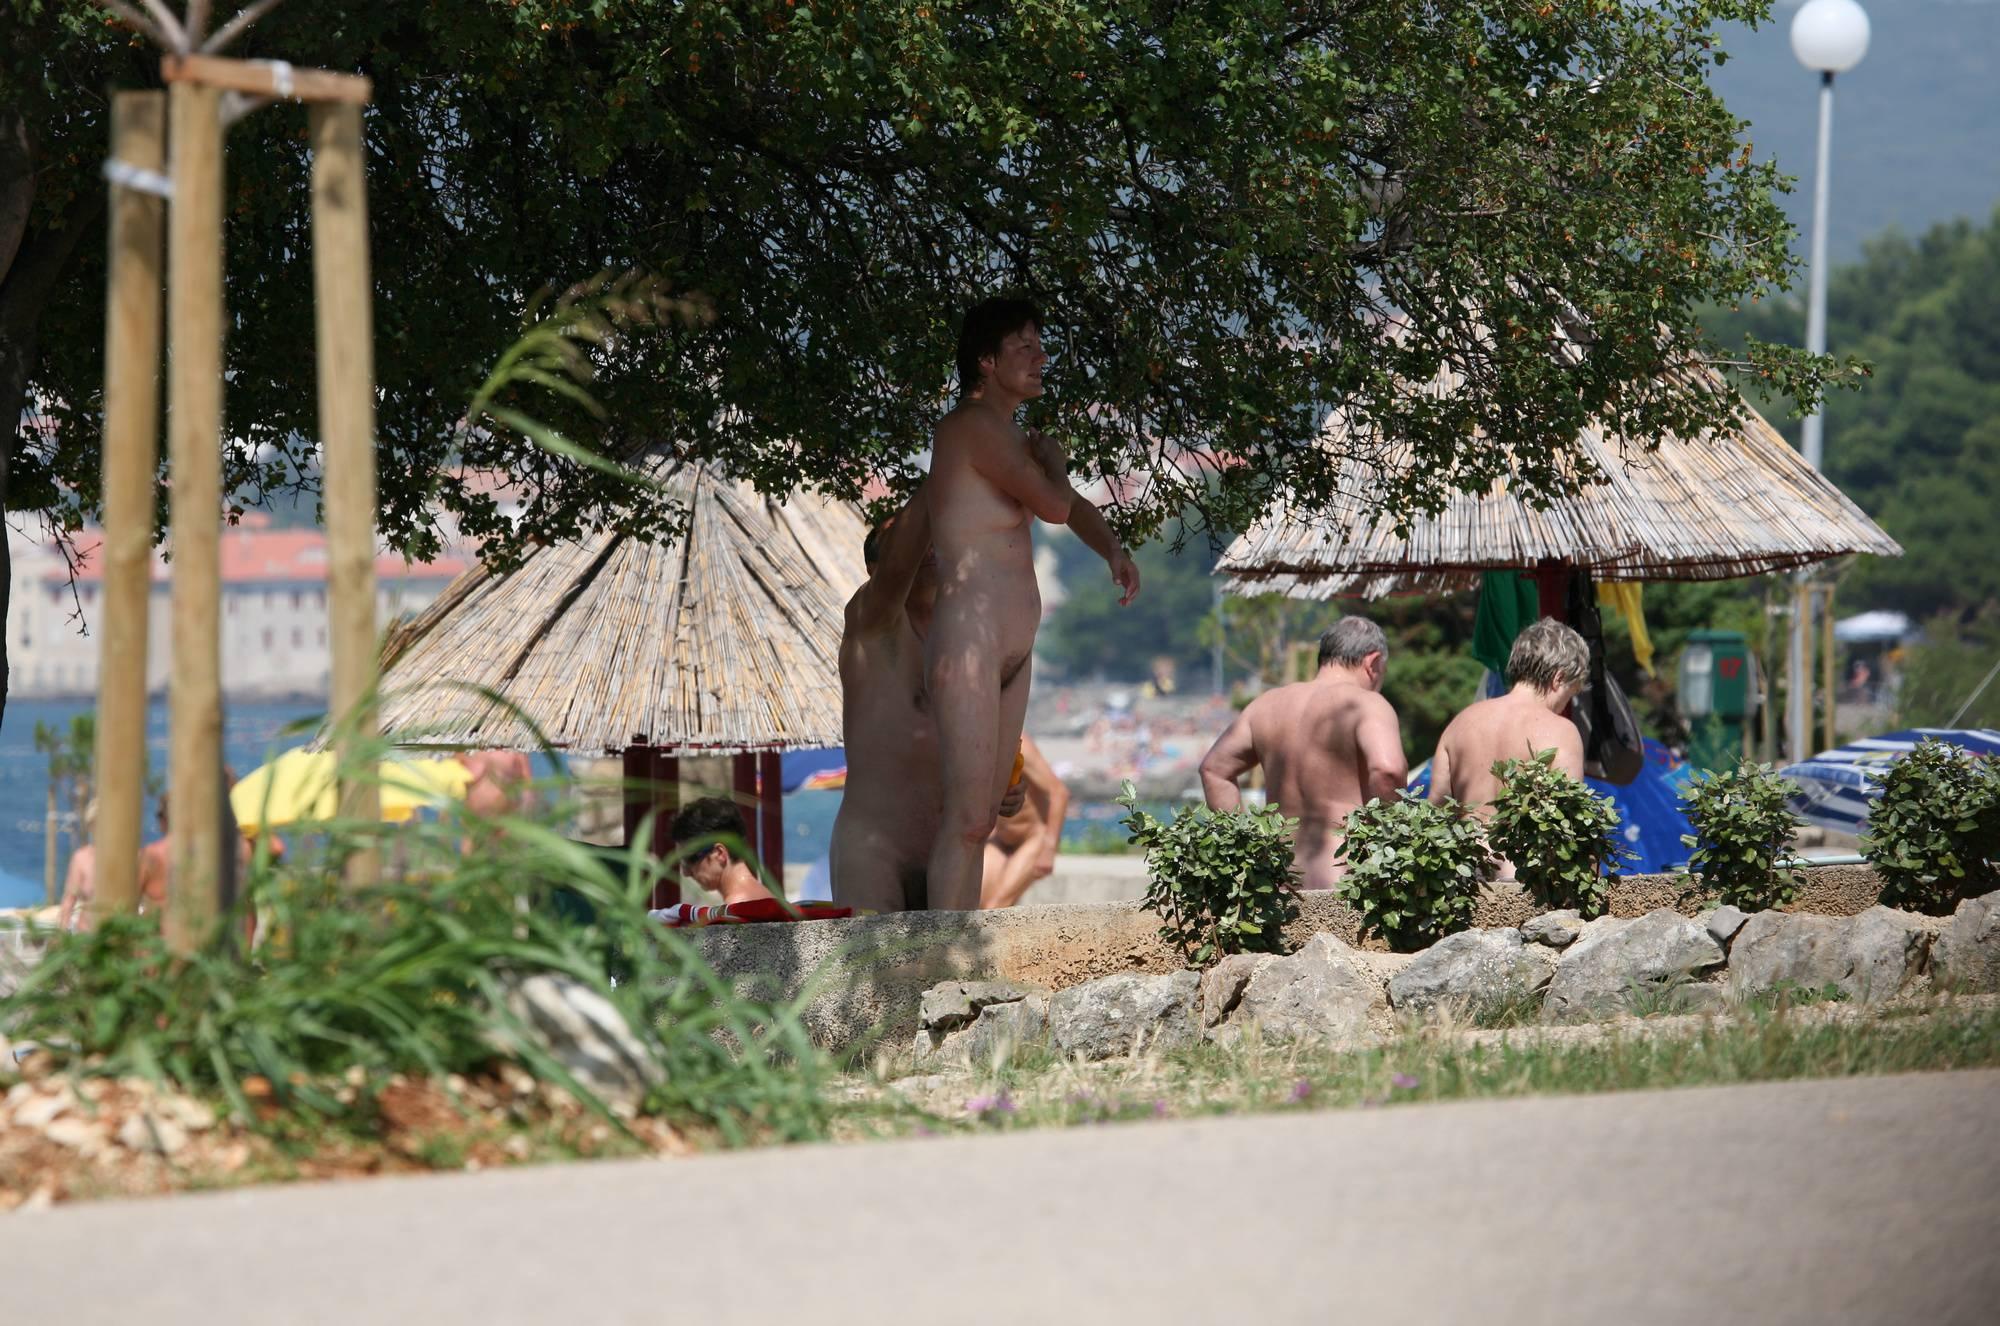 Nudist Photos Bondi Beach-Park Grounds - 1